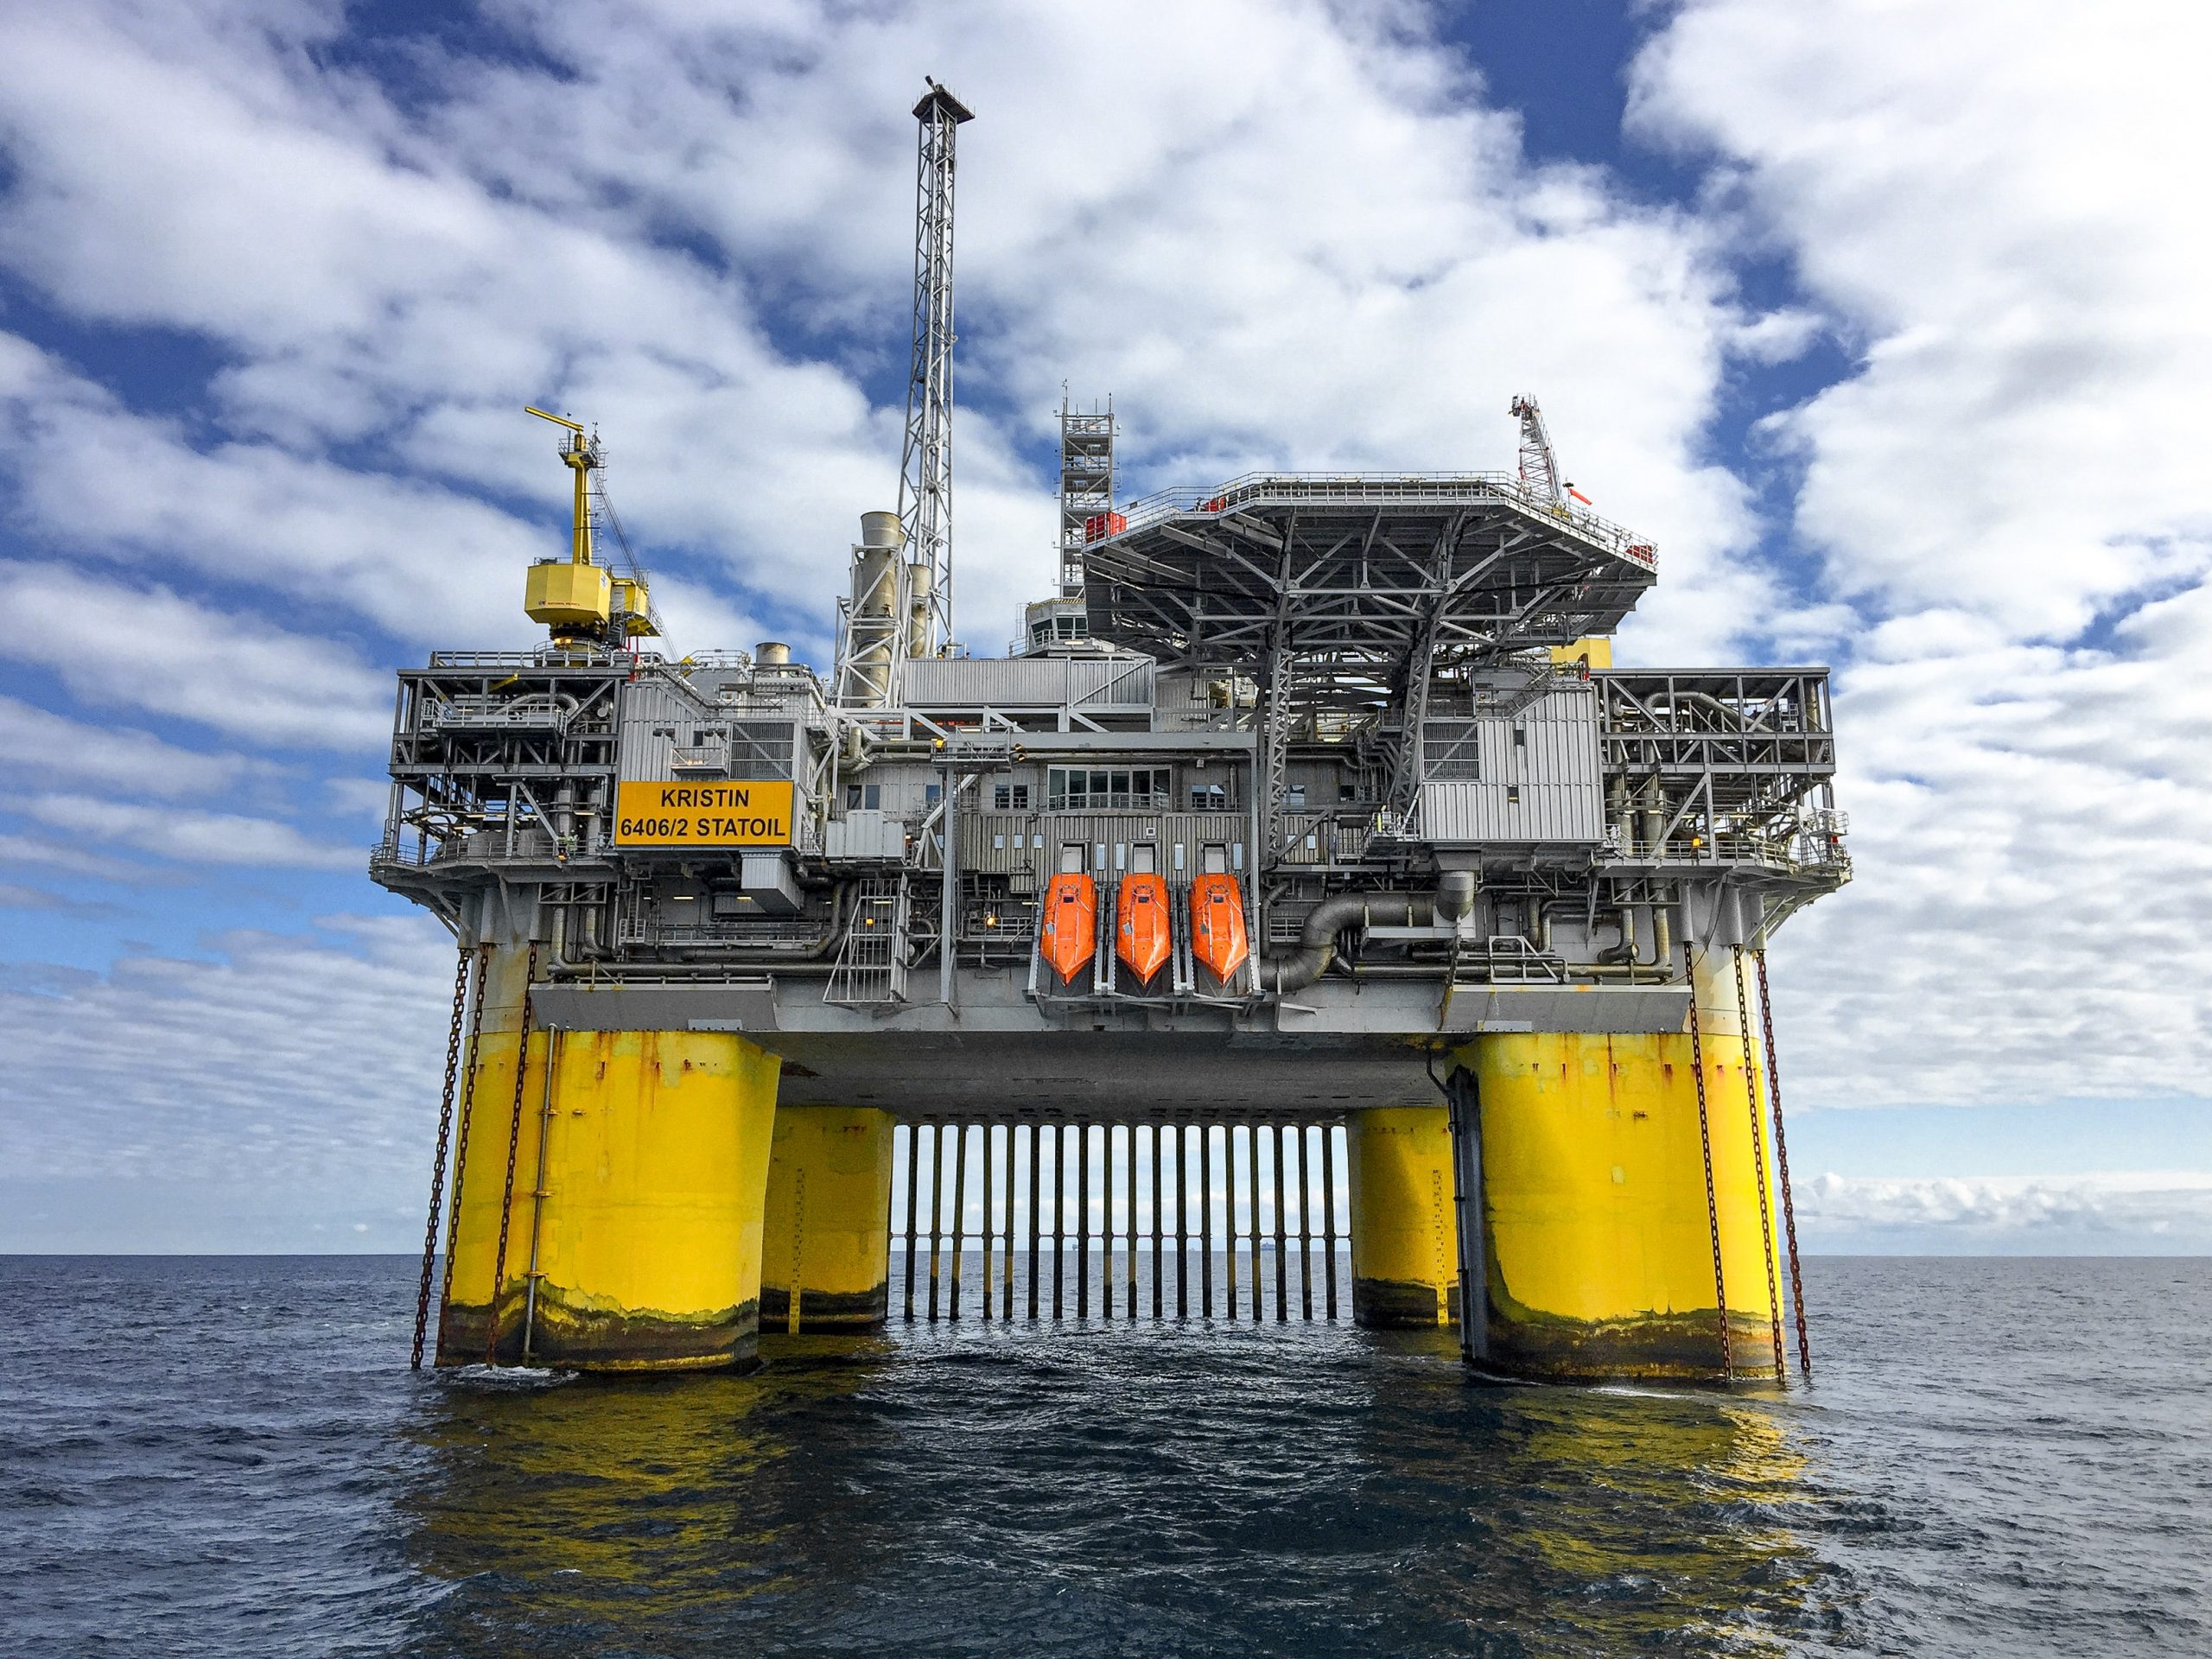 offshore platform at sunny sky